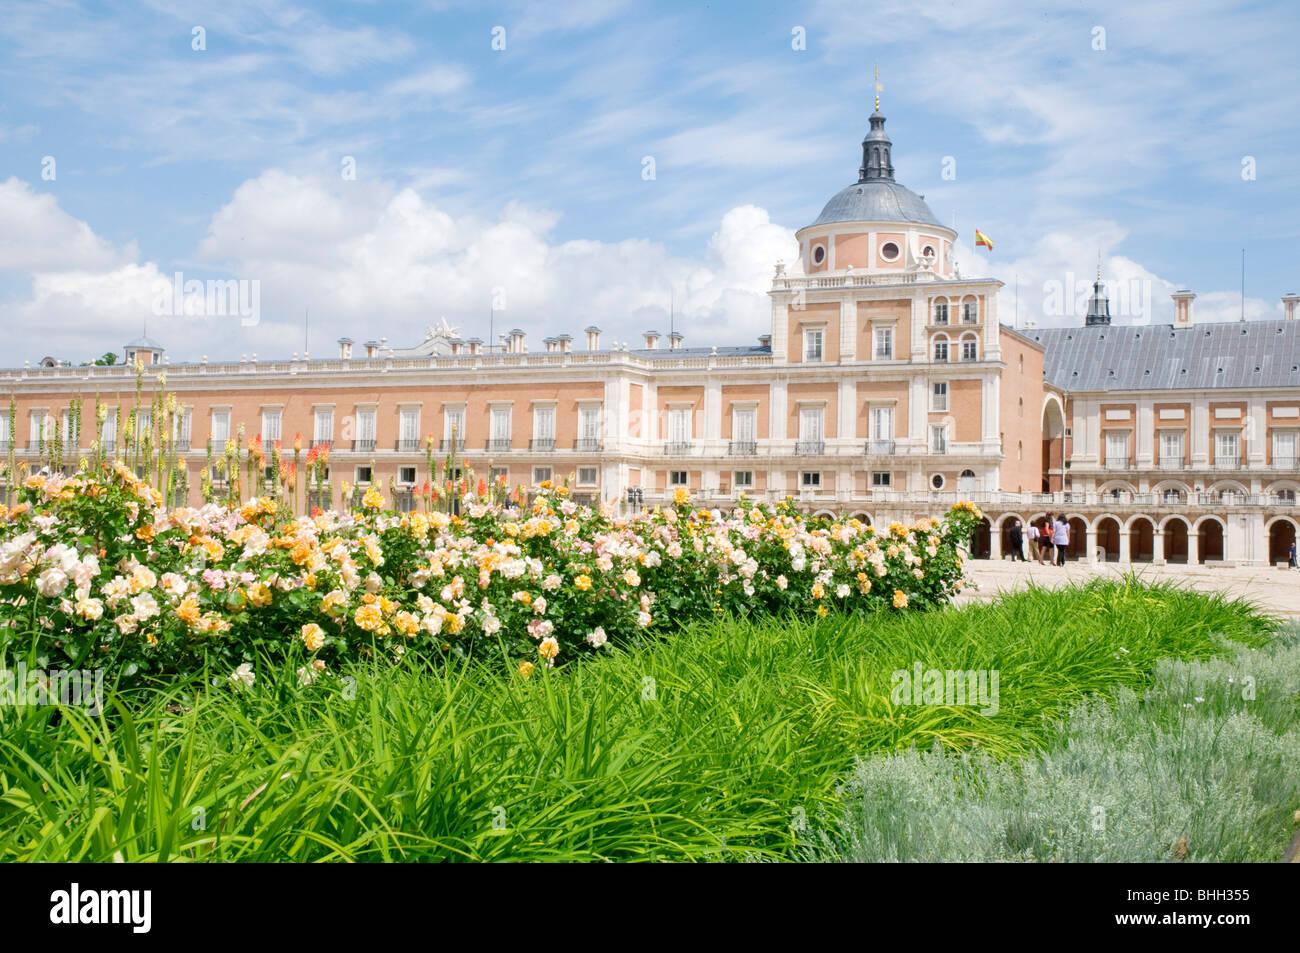 Royal Palace. Aranjuez,  Madrid province, Spain. - Stock Image